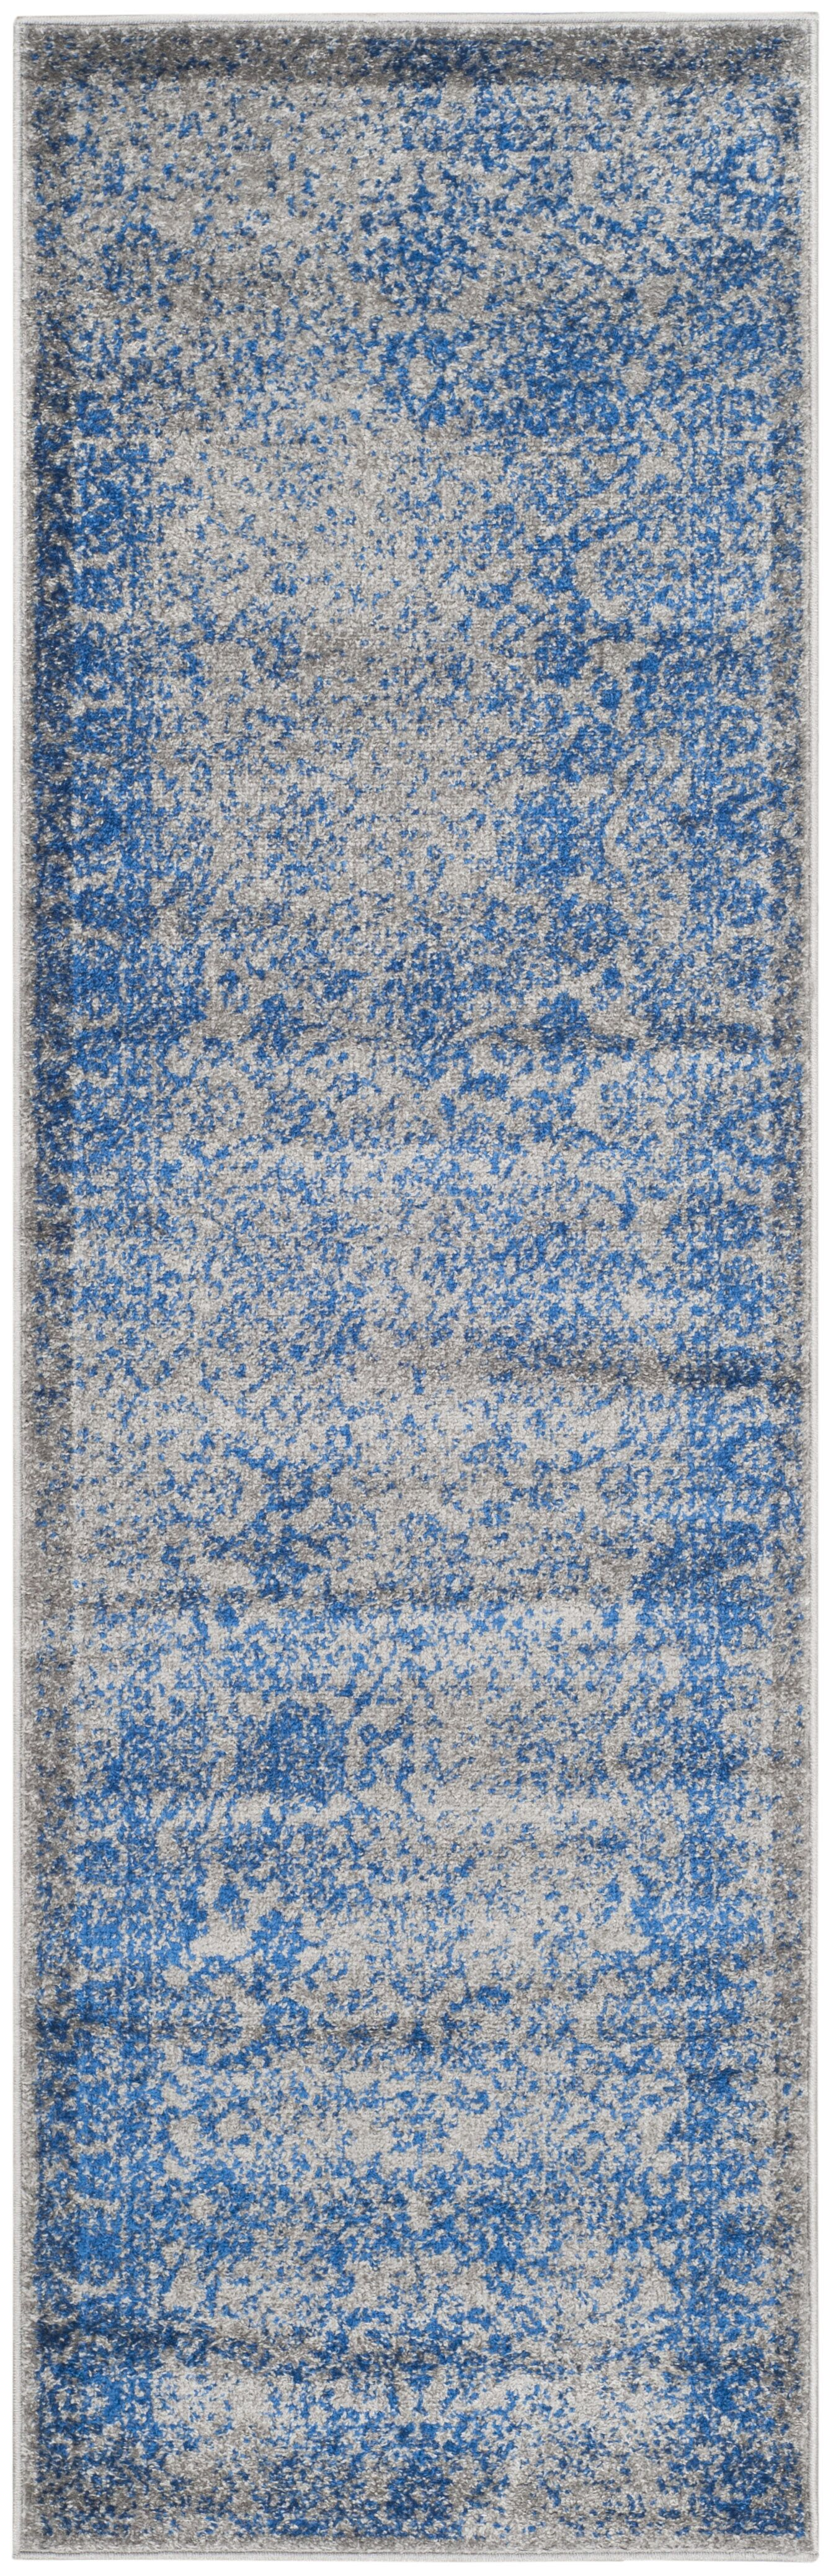 Hoyle Gray/Blue Area Rug Rug Size: Runner 2'6